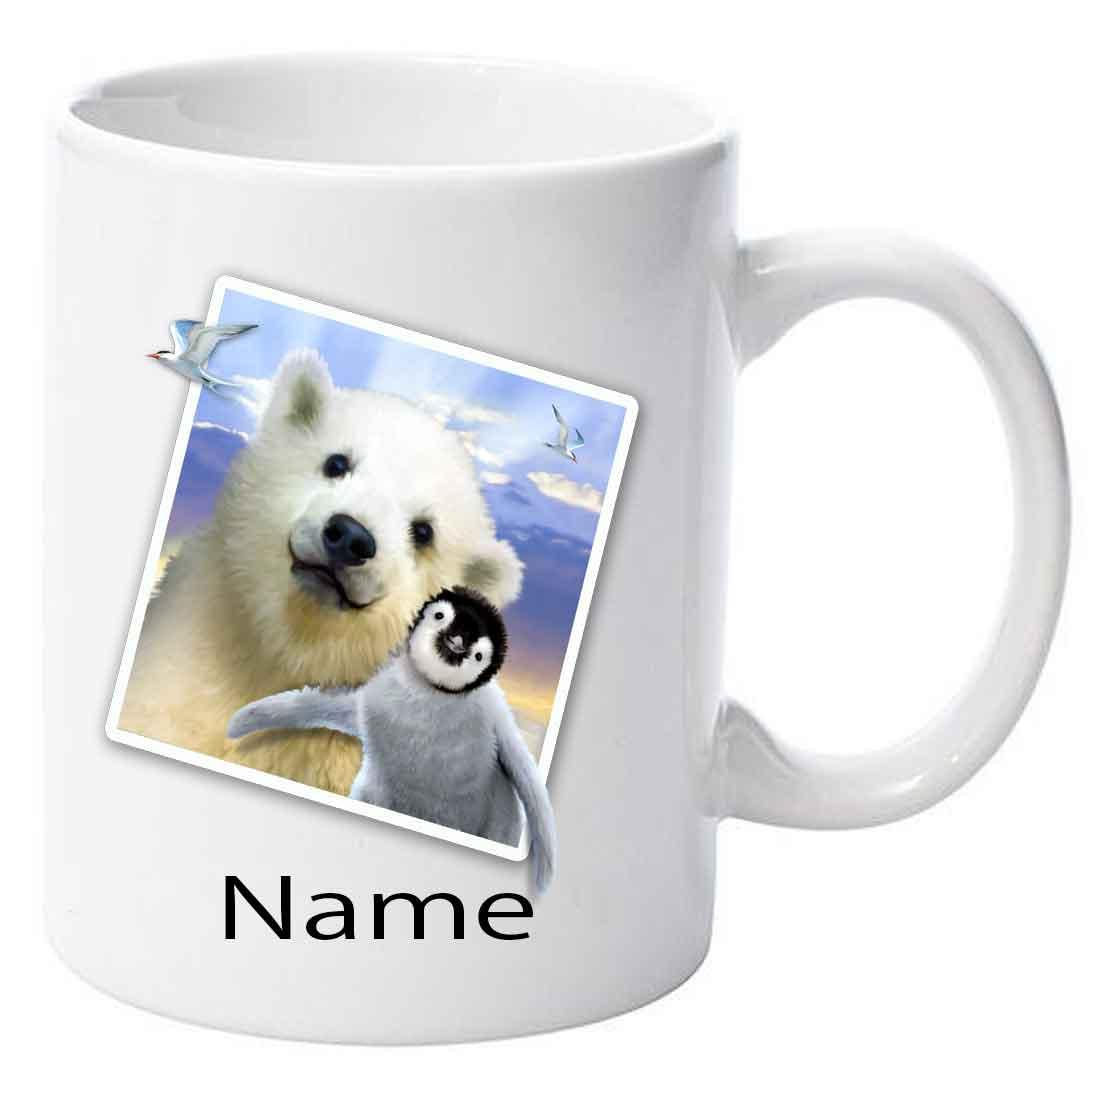 Personalised Polar-Pals Selfie Ceramic Mug